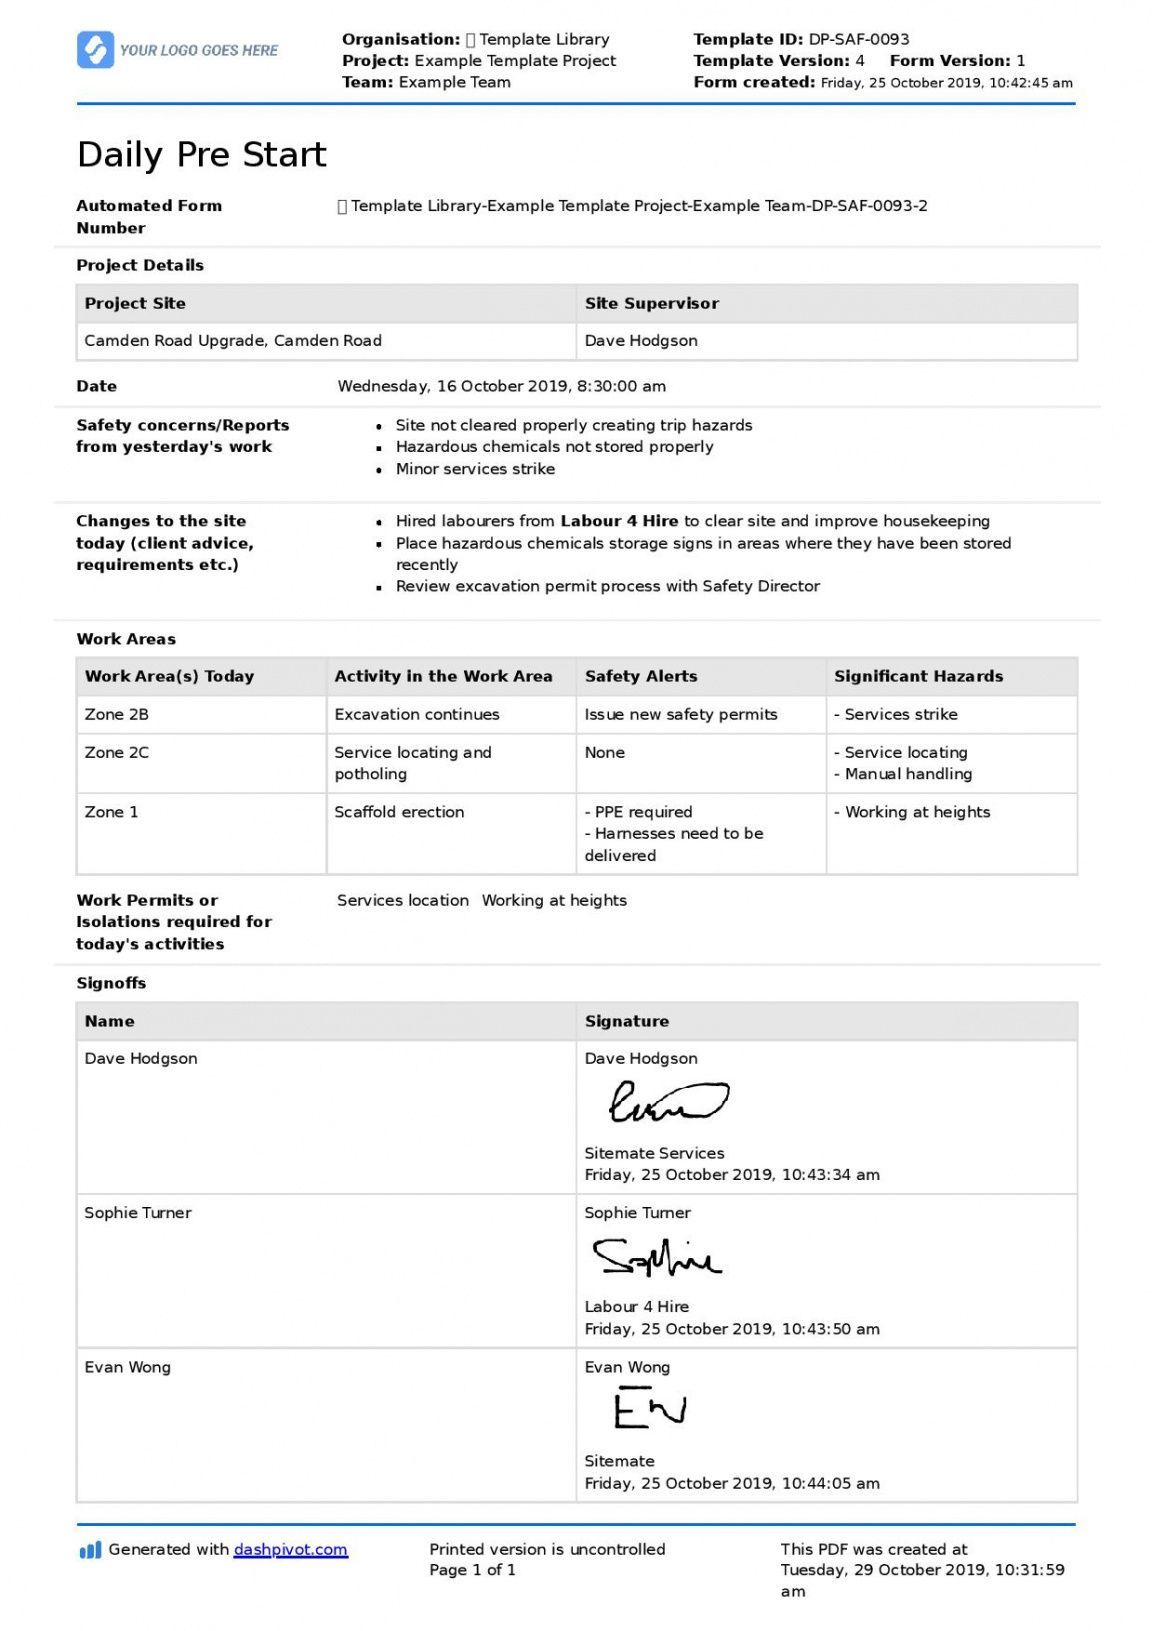 Printable Construction Pre Start Checklist For Any Pre Start Meeting Pre Construction Meeting Agenda Template Meeting Agenda Template Meeting Agenda Construction project meeting minutes template